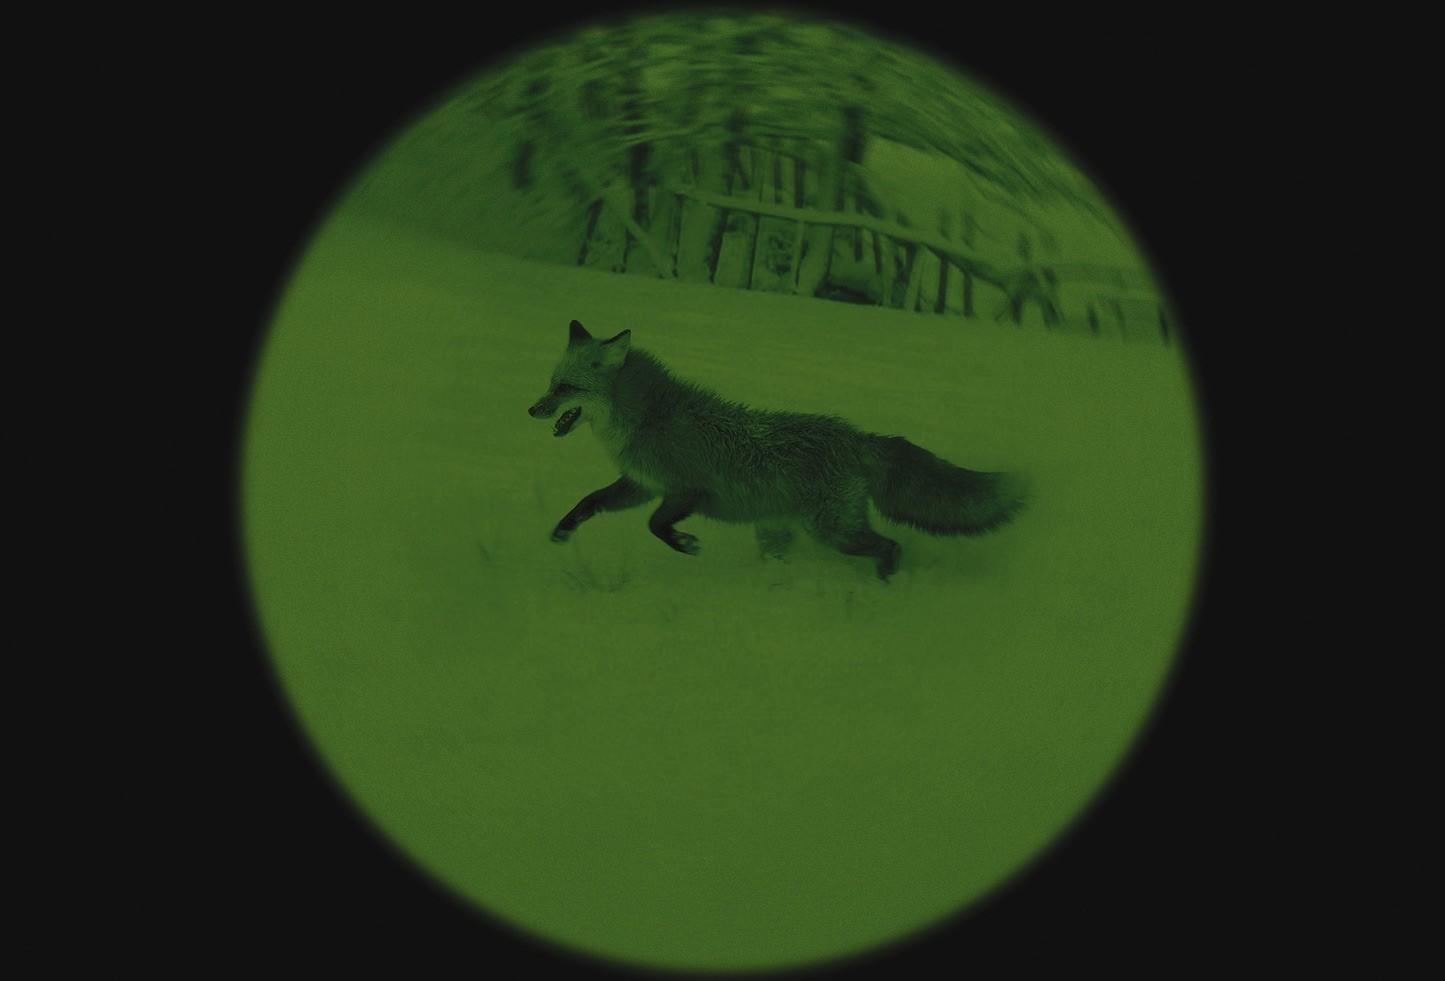 jumelles vision nocturne yukon tracker 3x42 jumelles vision nocturne made in chasse. Black Bedroom Furniture Sets. Home Design Ideas